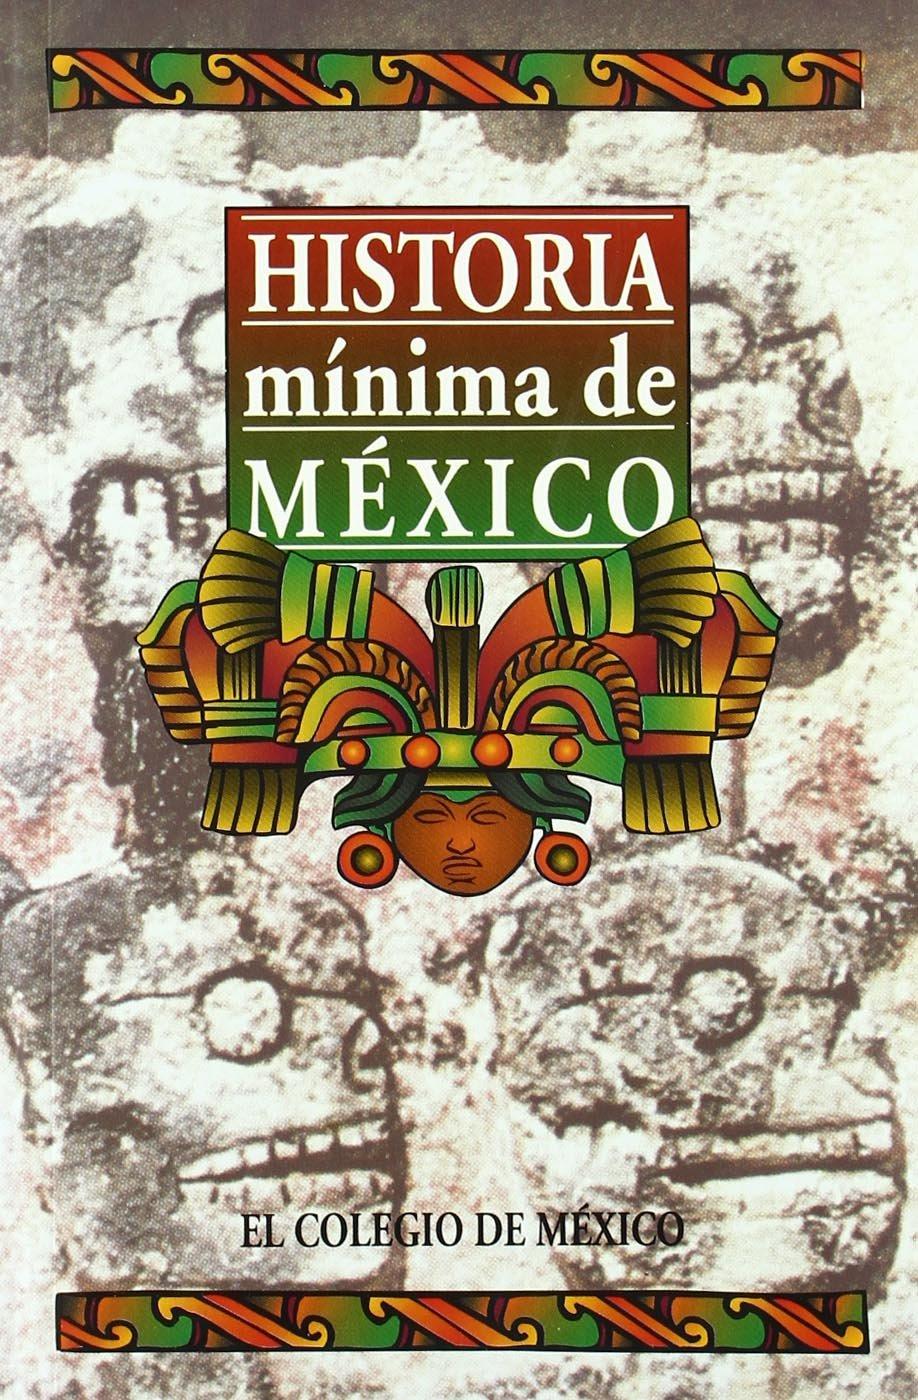 Historia minima de México: Amazon.es: Villegas, Daniel C.: Libros